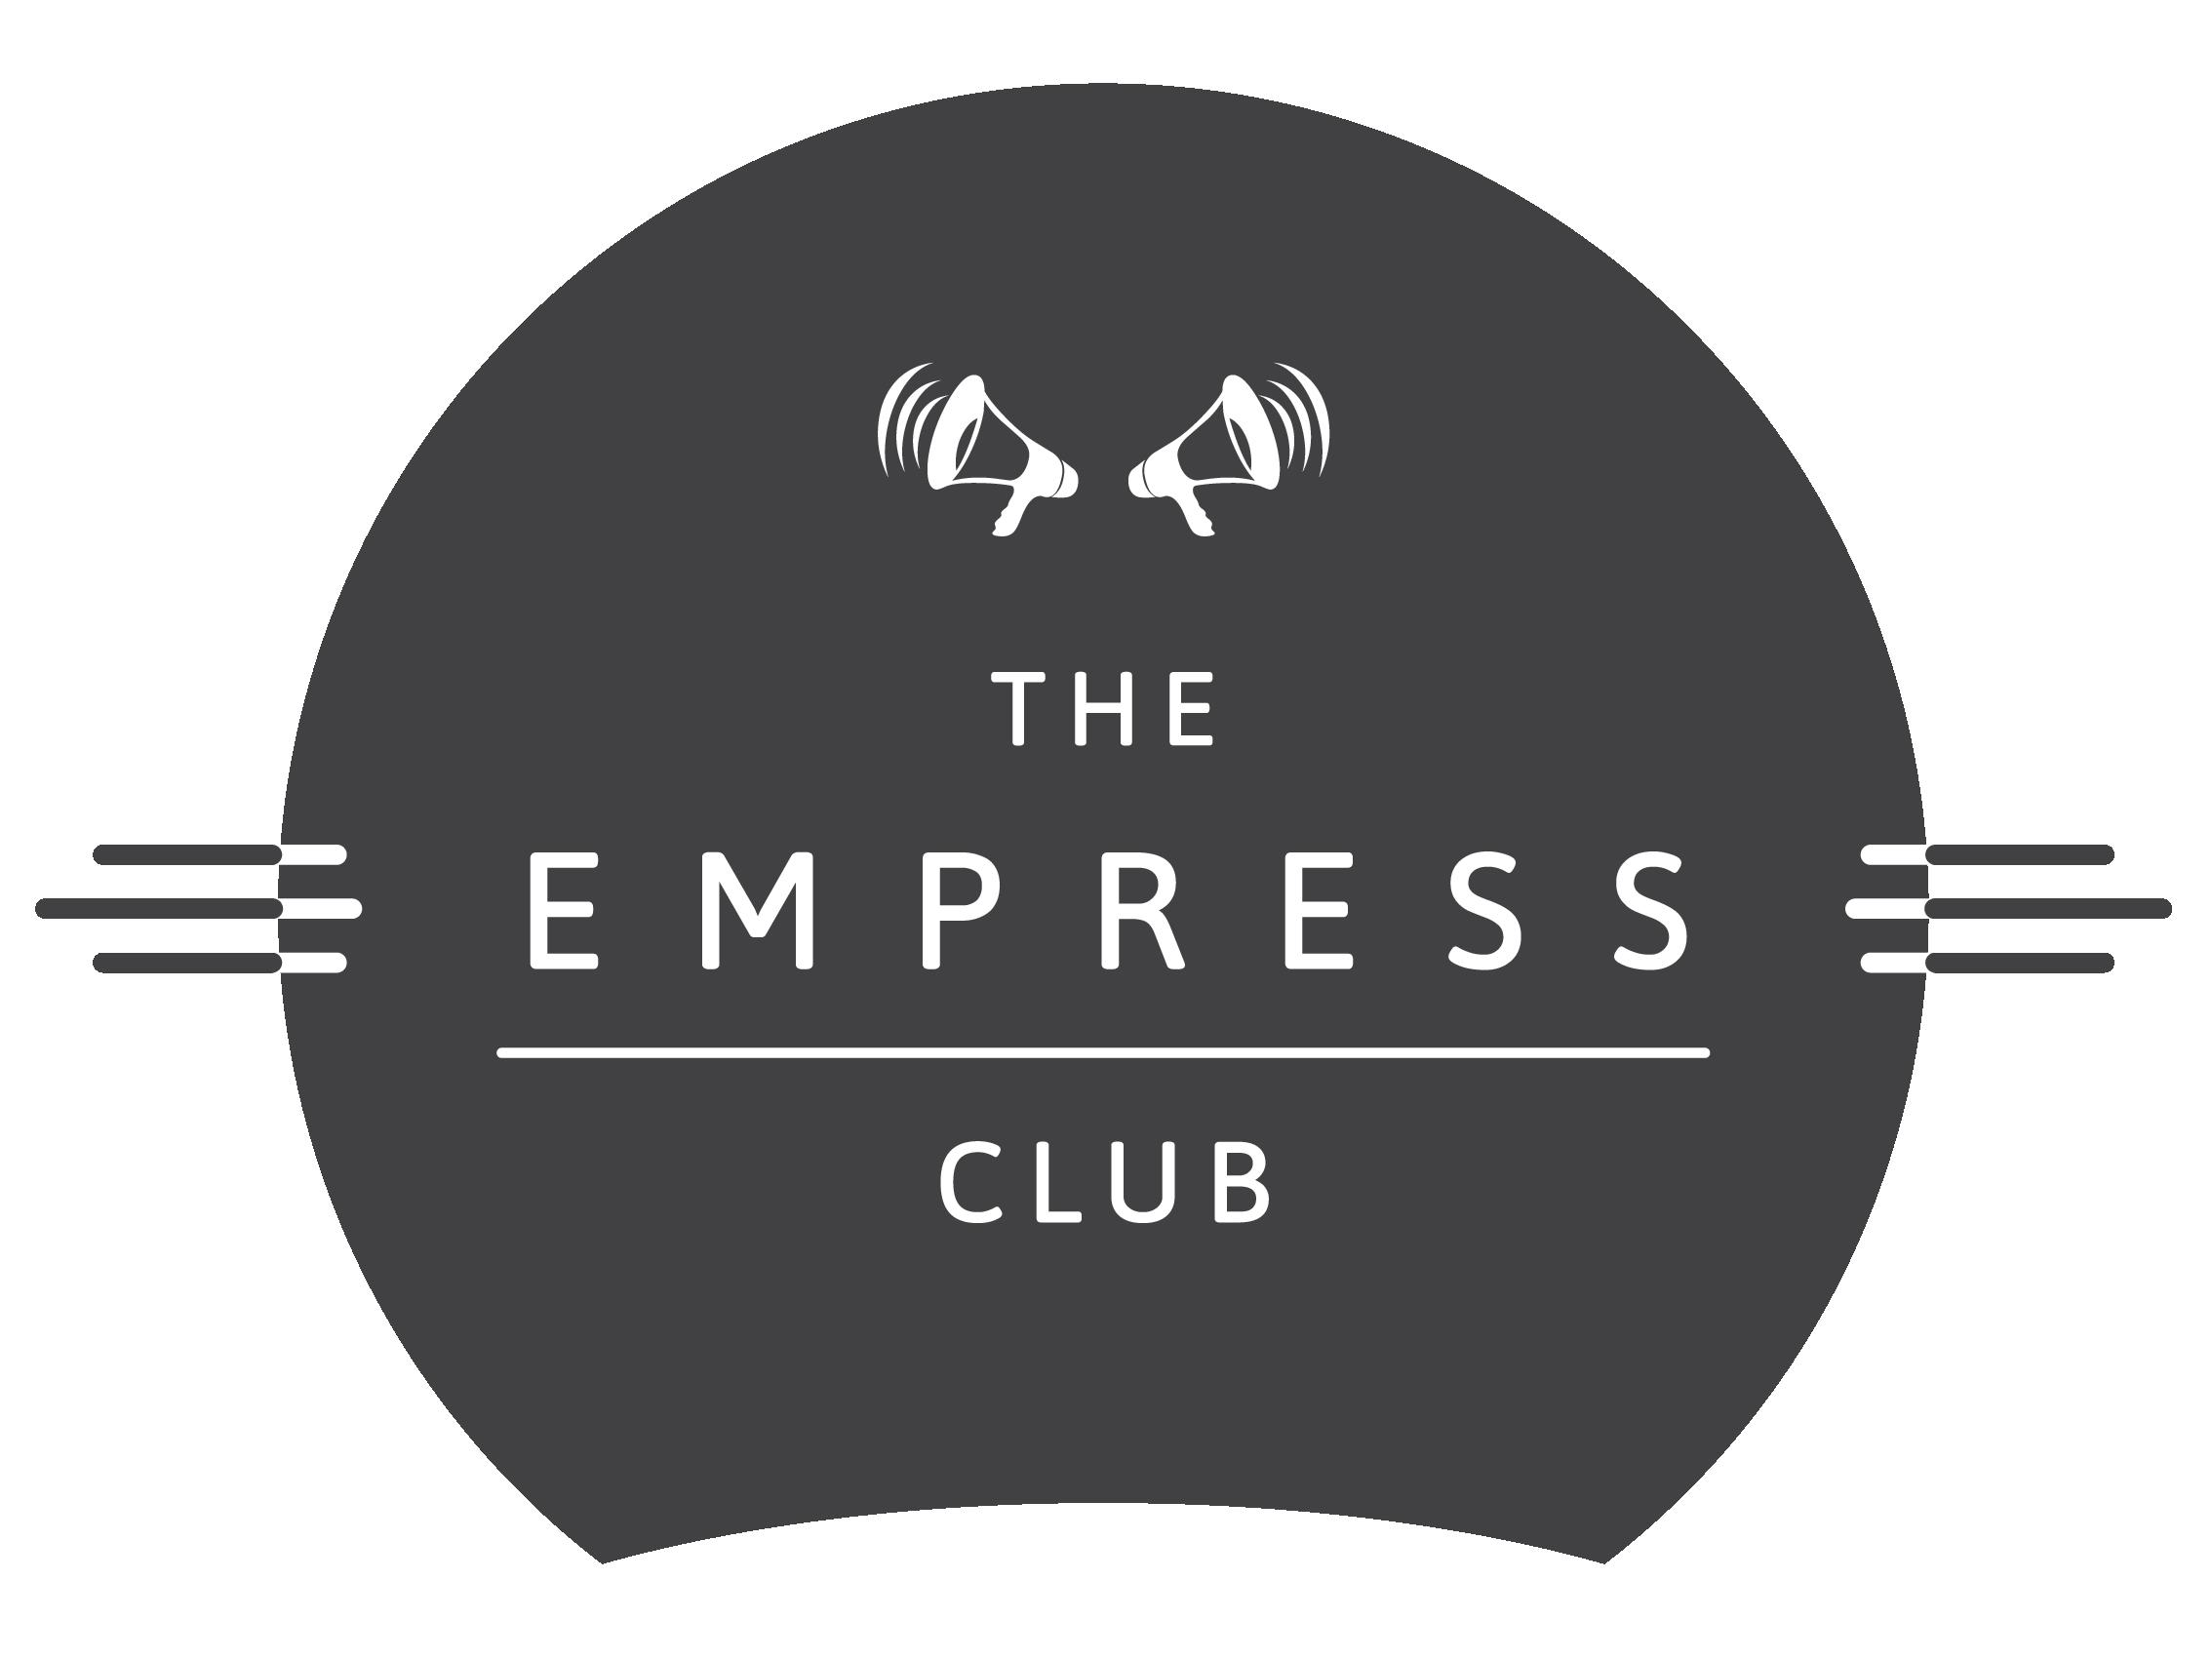 TheEmpressClub